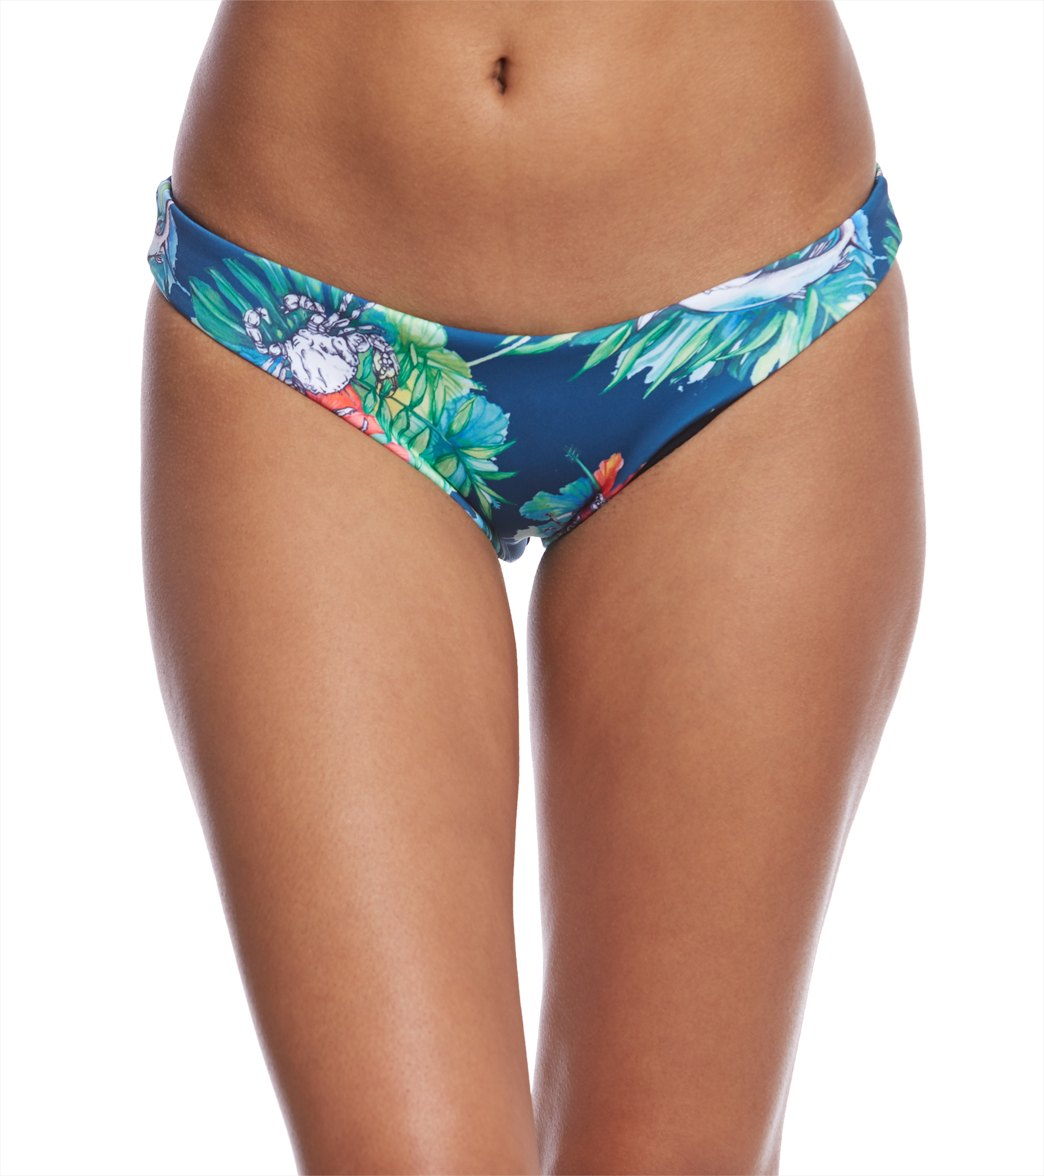 c41f4bb3557c6 Akela Surf Women's Amuse Neoprene Bikini Bottom at SwimOutlet.com - Free  Shipping